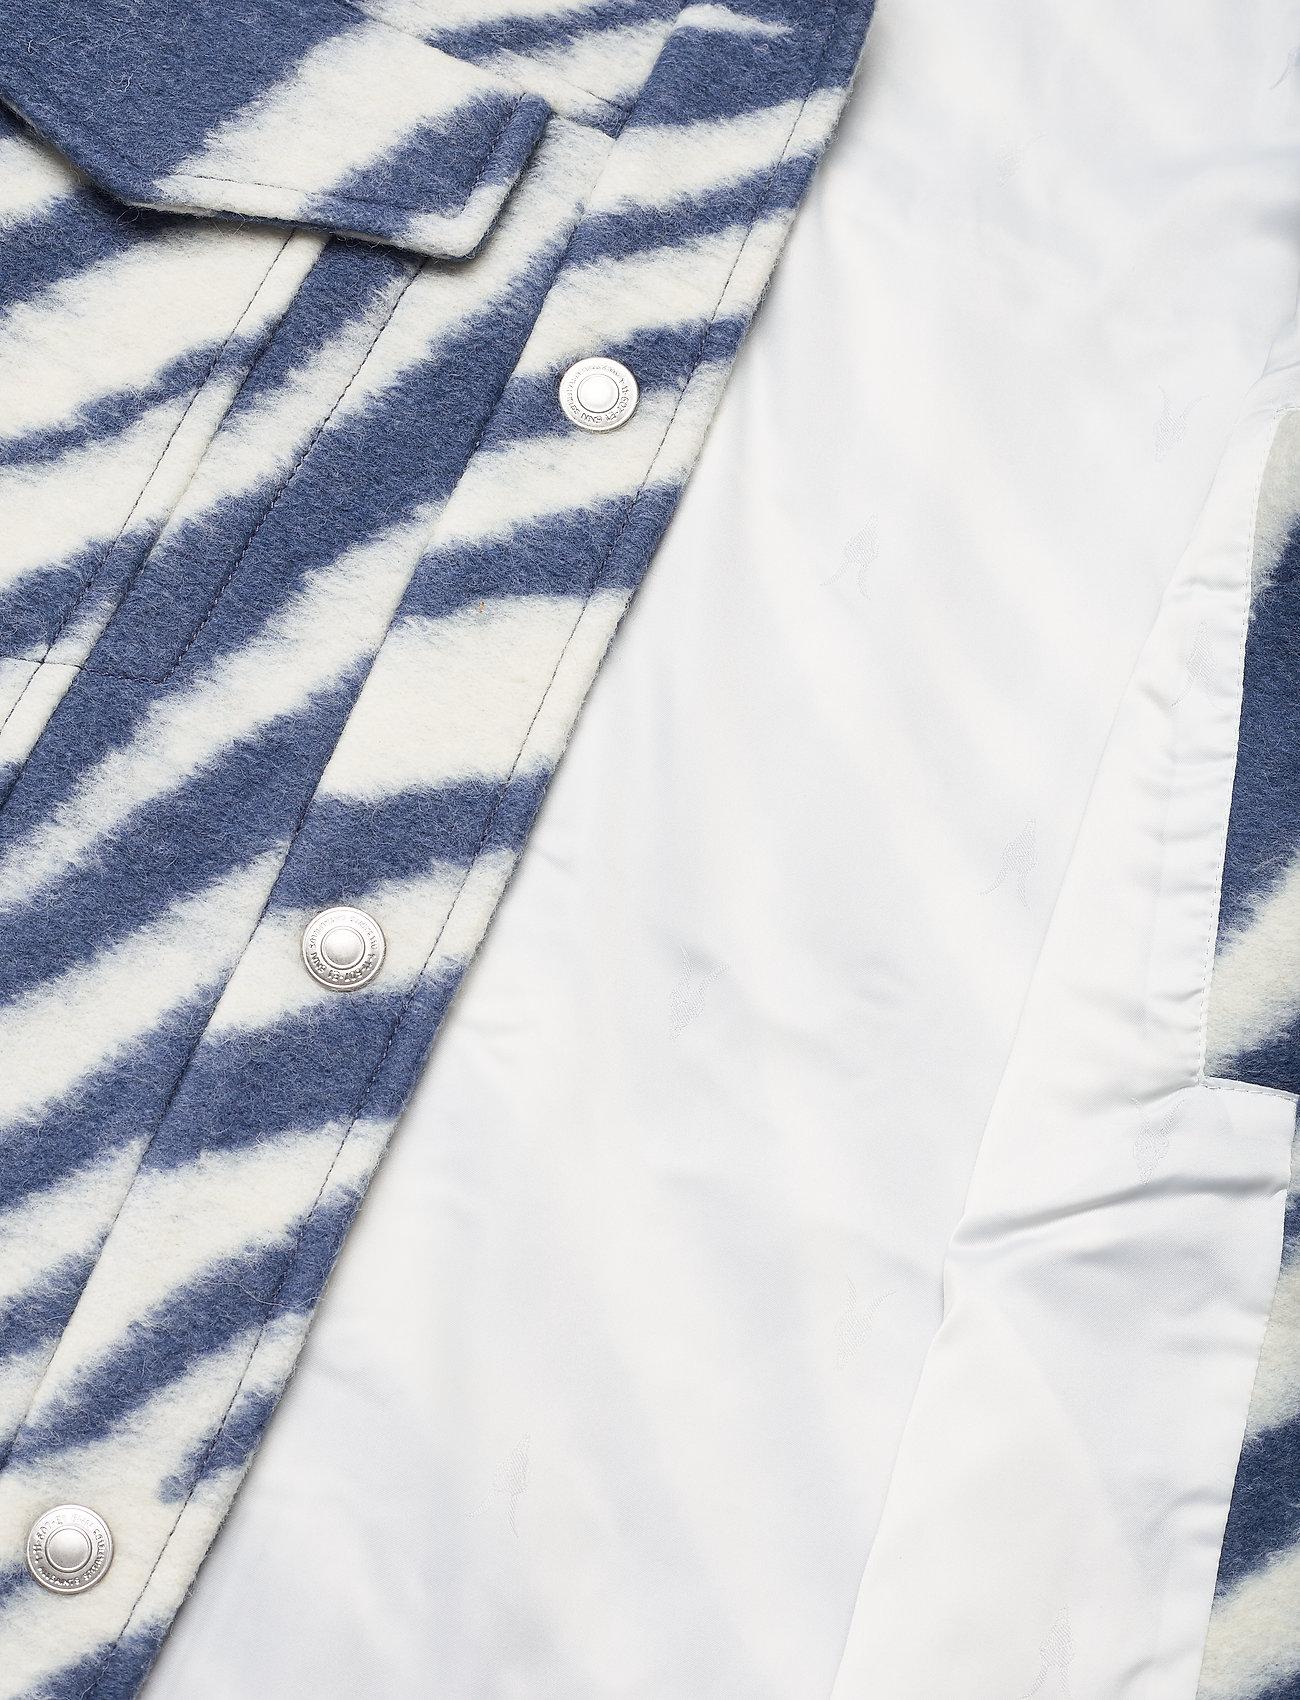 AllSaints - FAYE JACKET - wolljacken - blue/white - 4